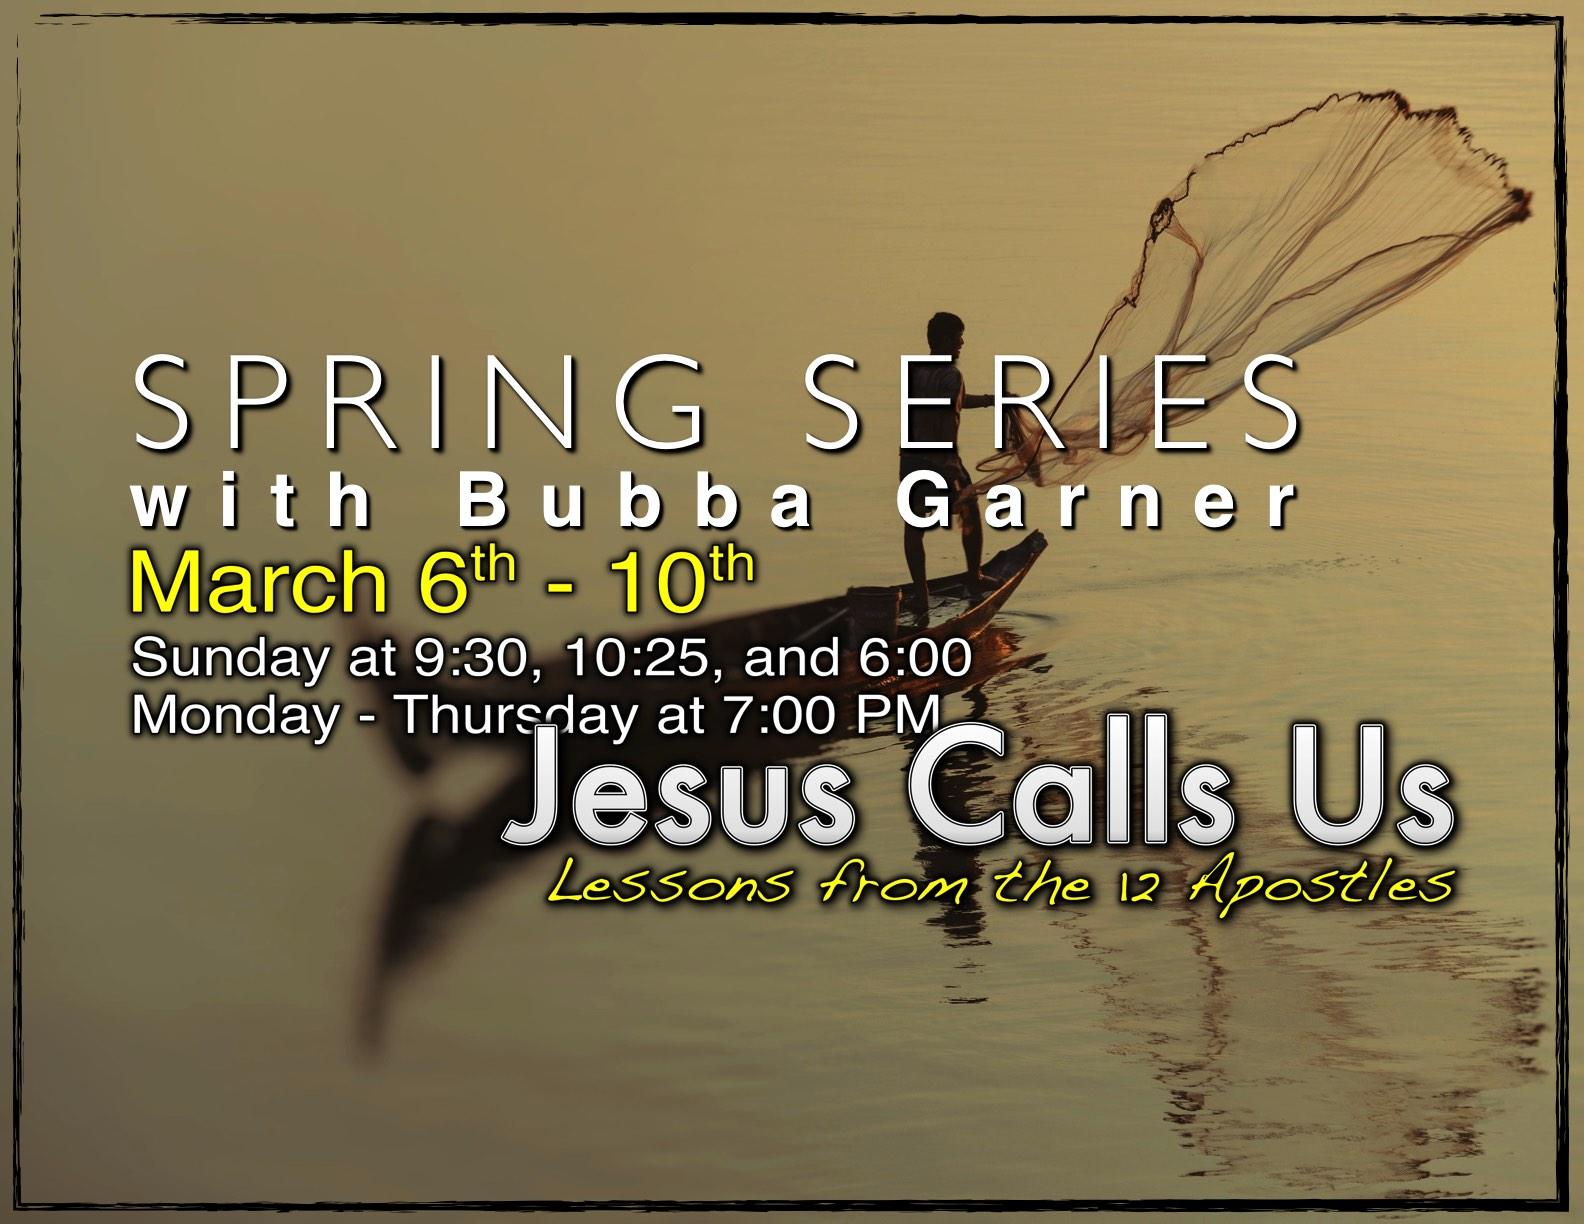 Spring Series with Bubba Garner